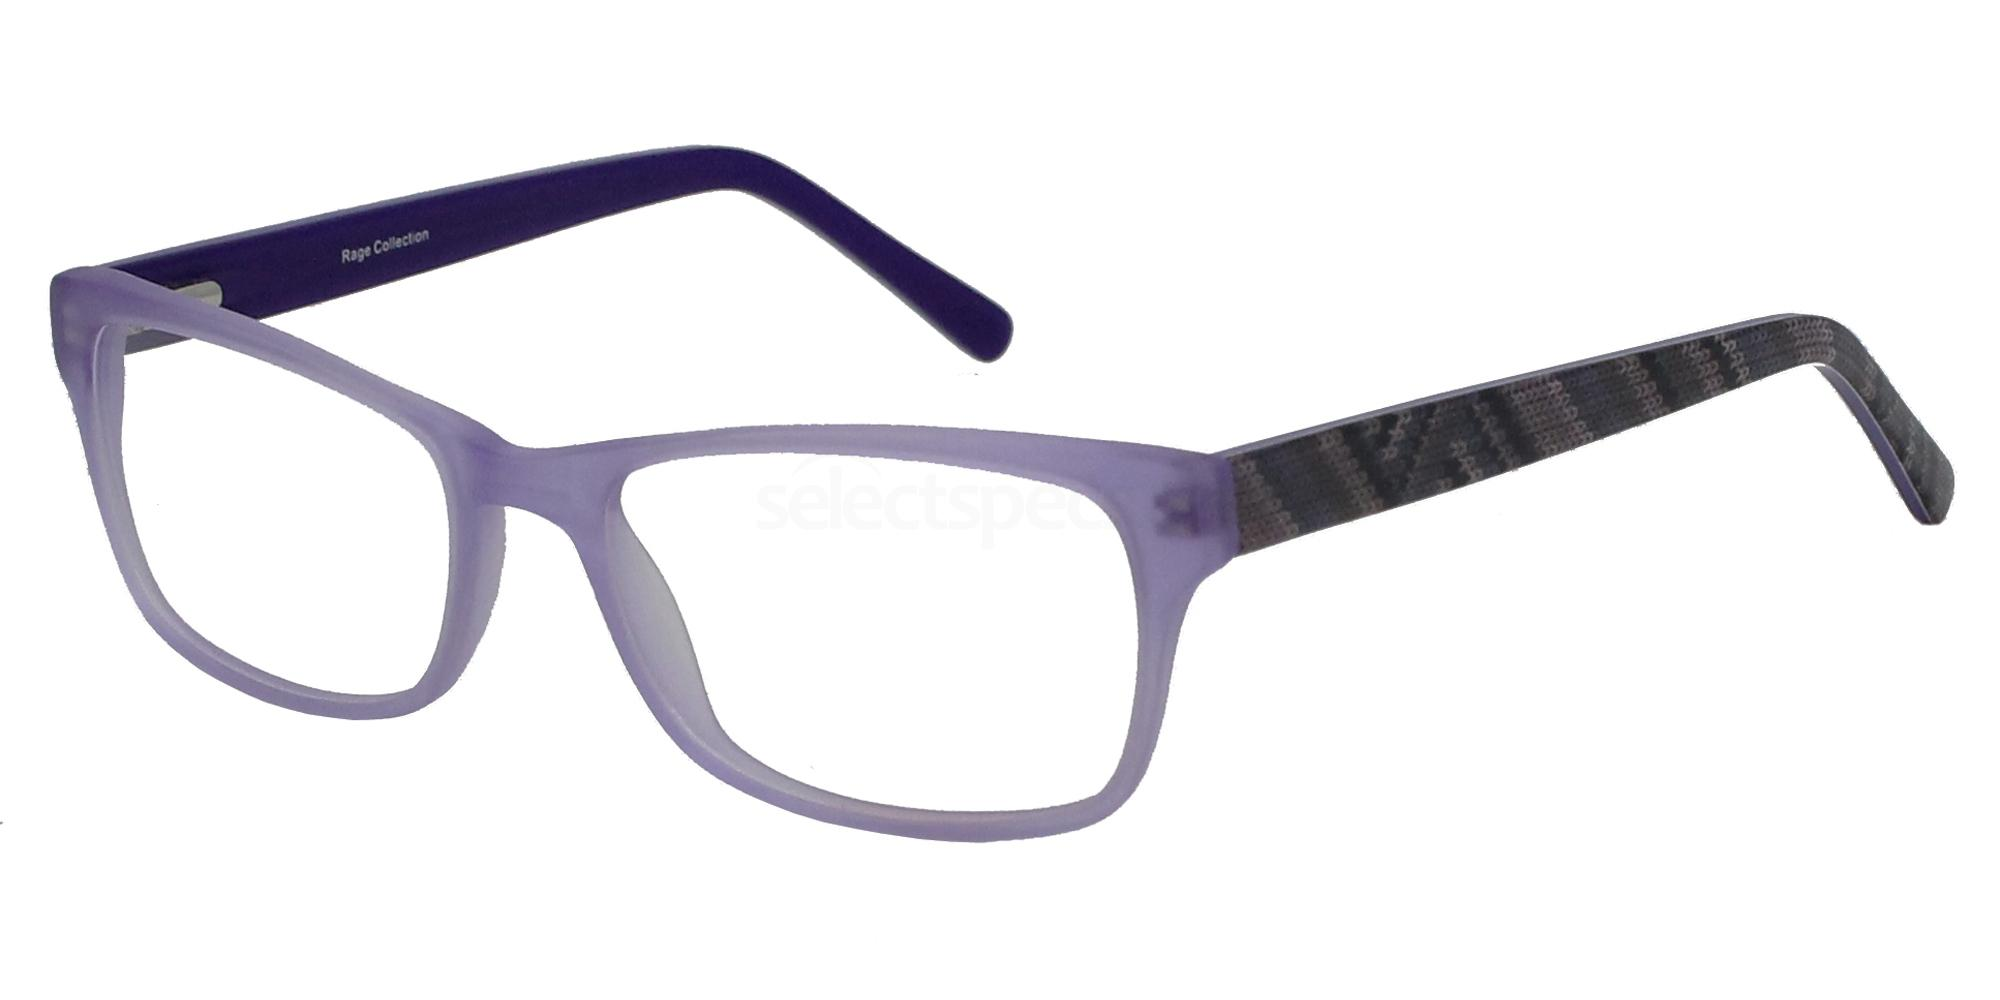 01 447 Glasses, Rage